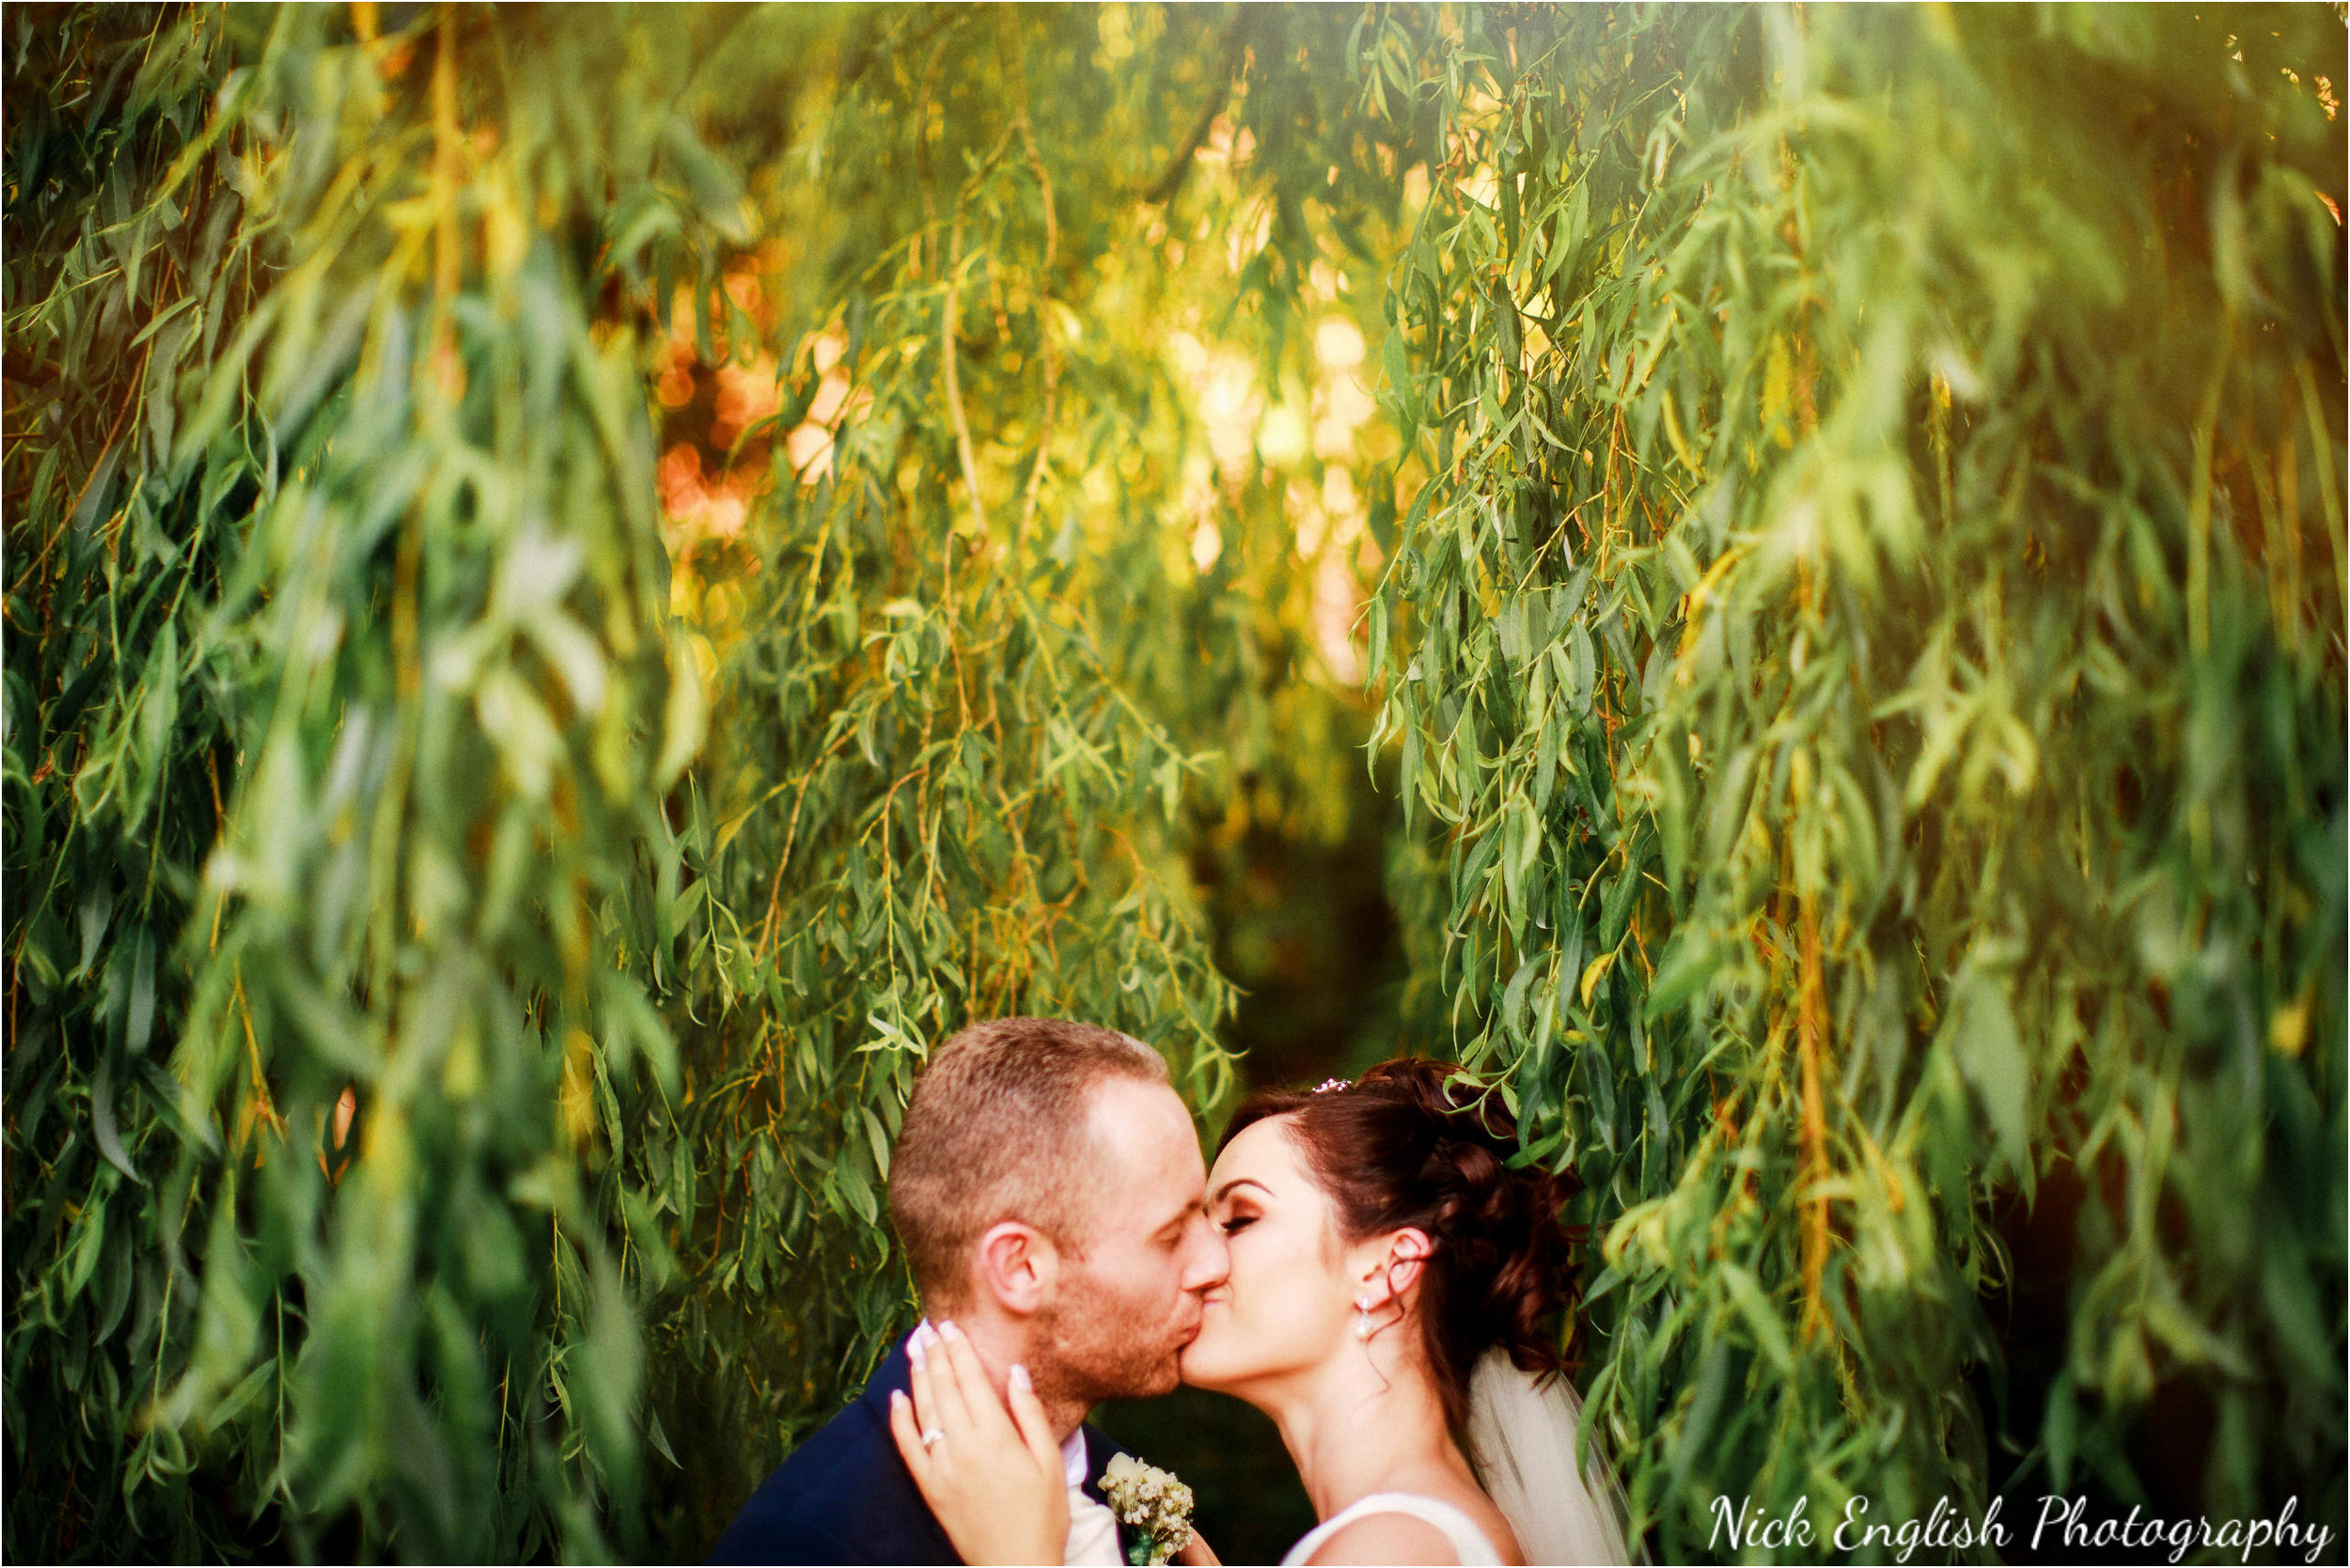 Emily David Wedding Photographs at Barton Grange Preston by Nick English Photography 202jpg.jpeg